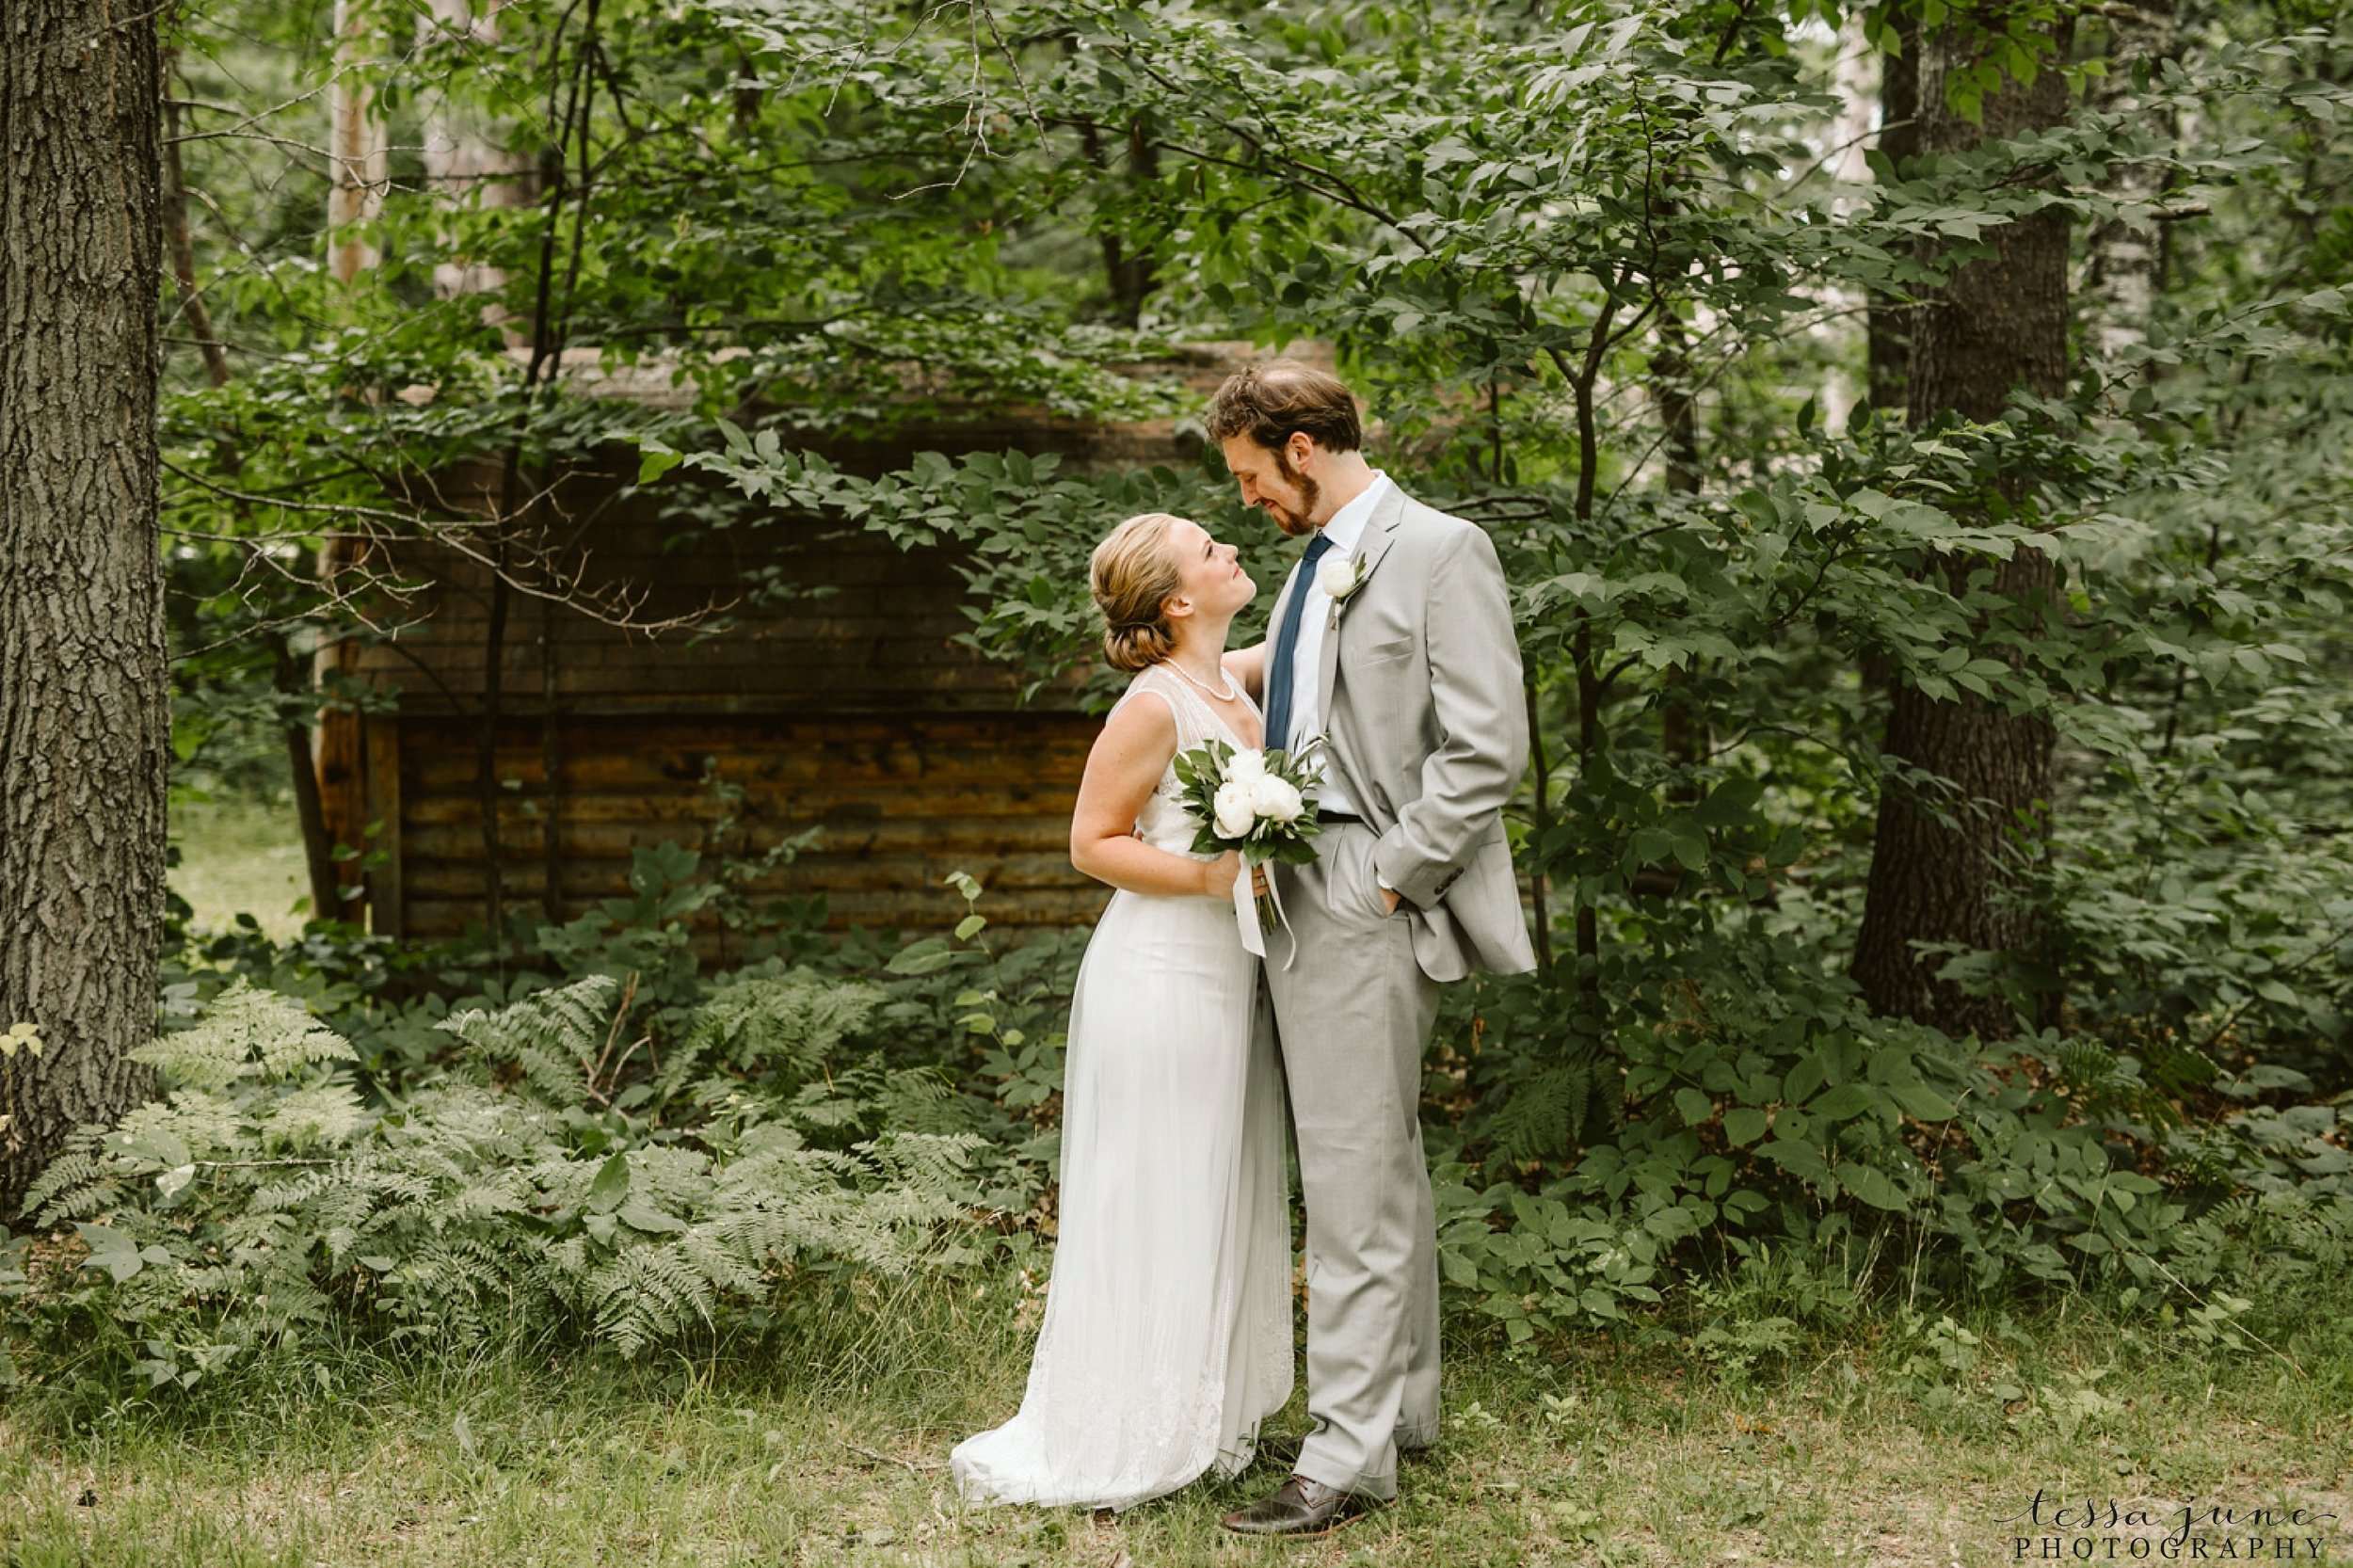 grandview-lodge-intimate-wedding-nisswa-minnesota_0026.jpg